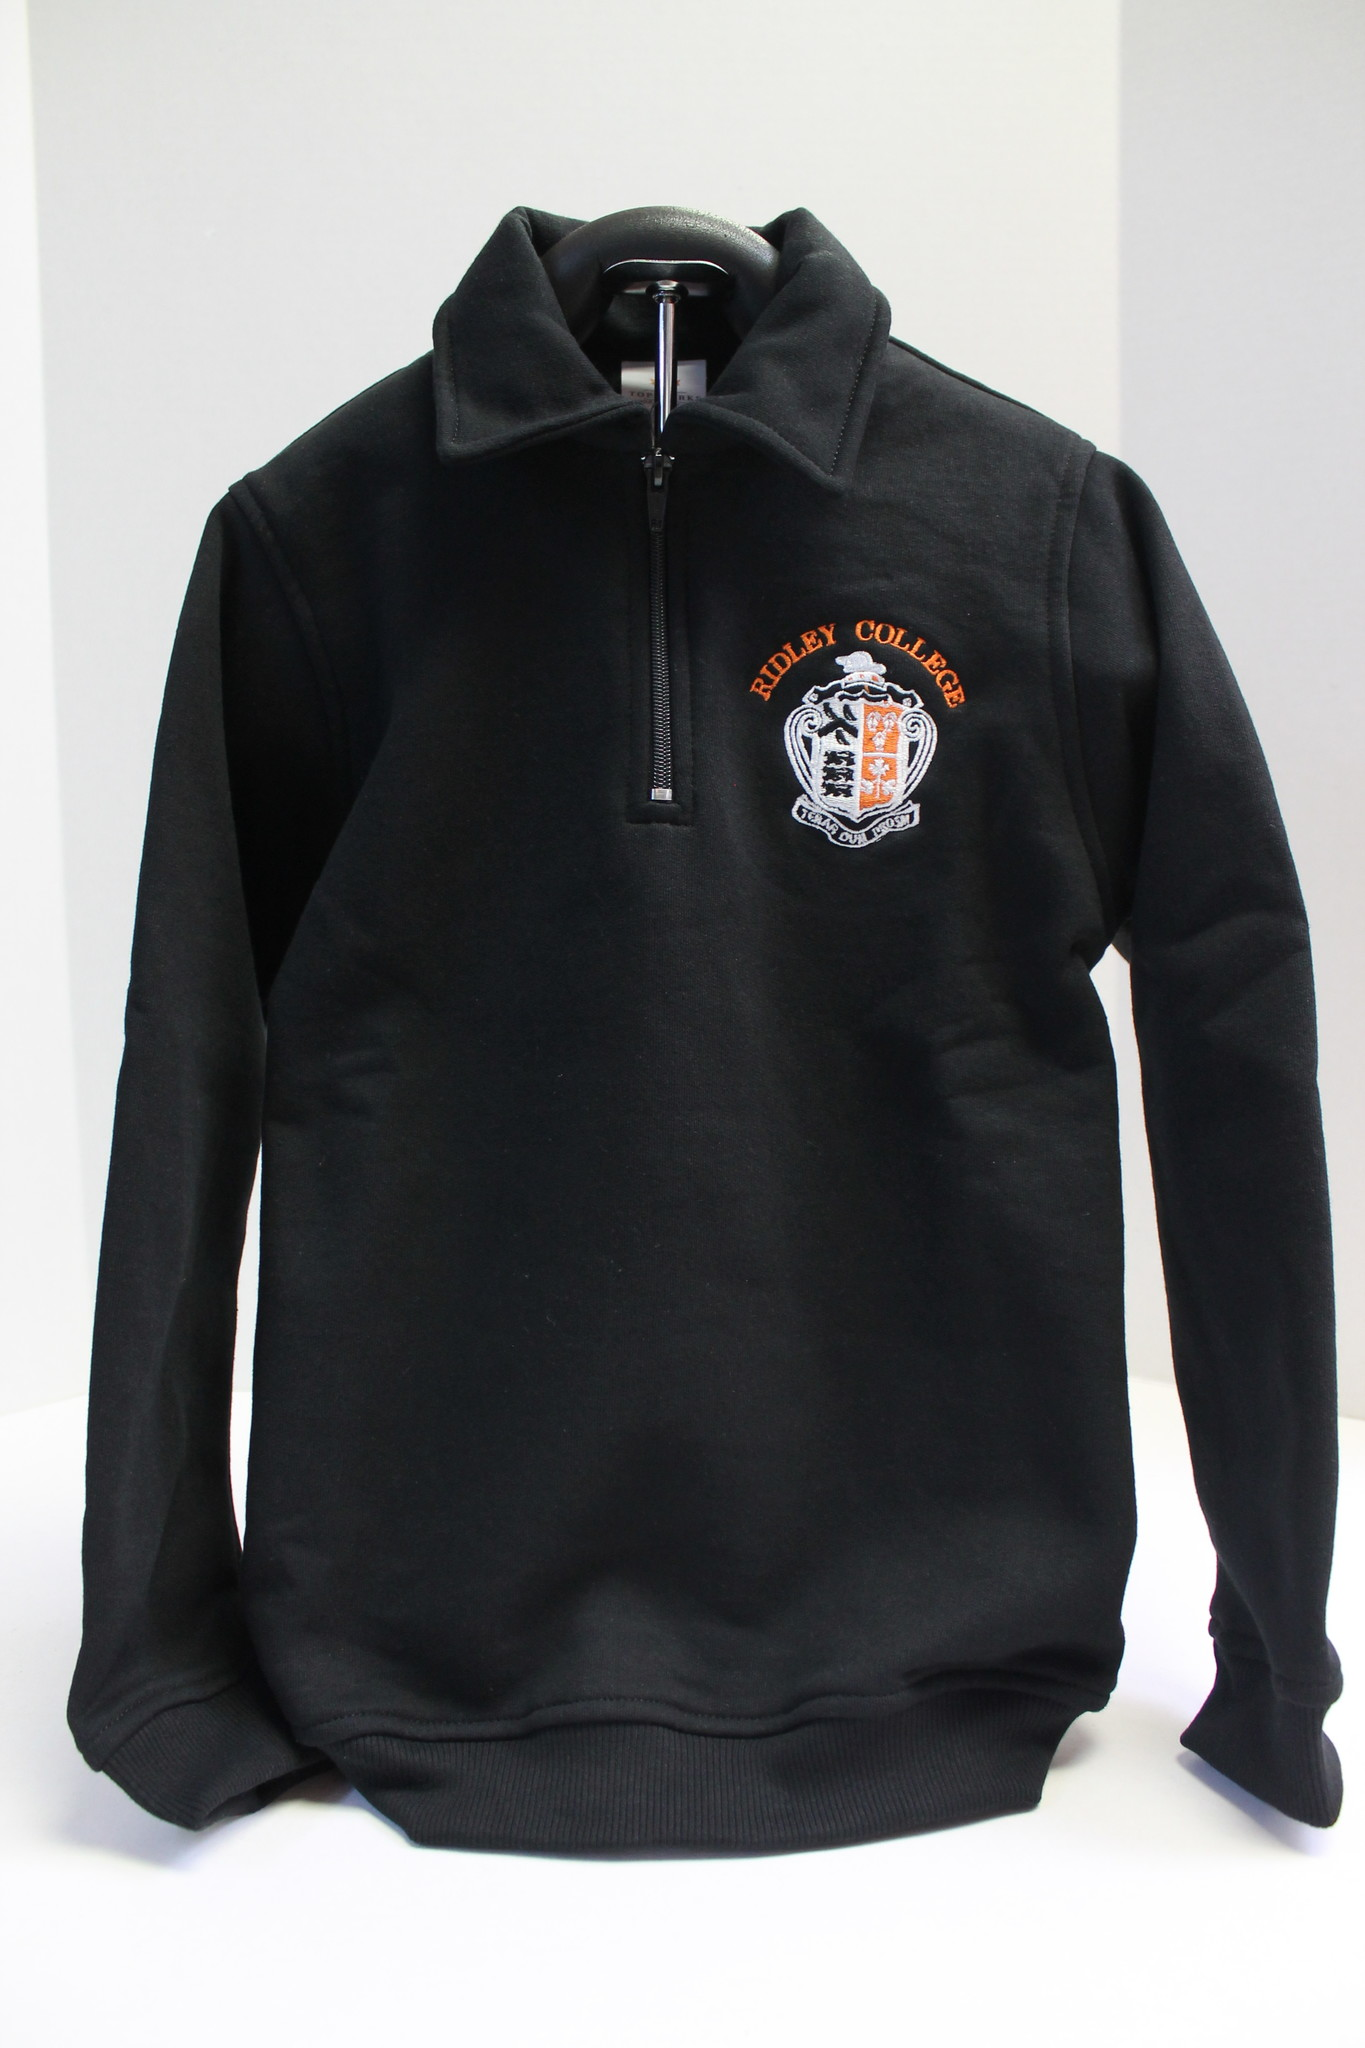 1/4 Zip Sweatshirt (gr.Jk-3 only) Youth